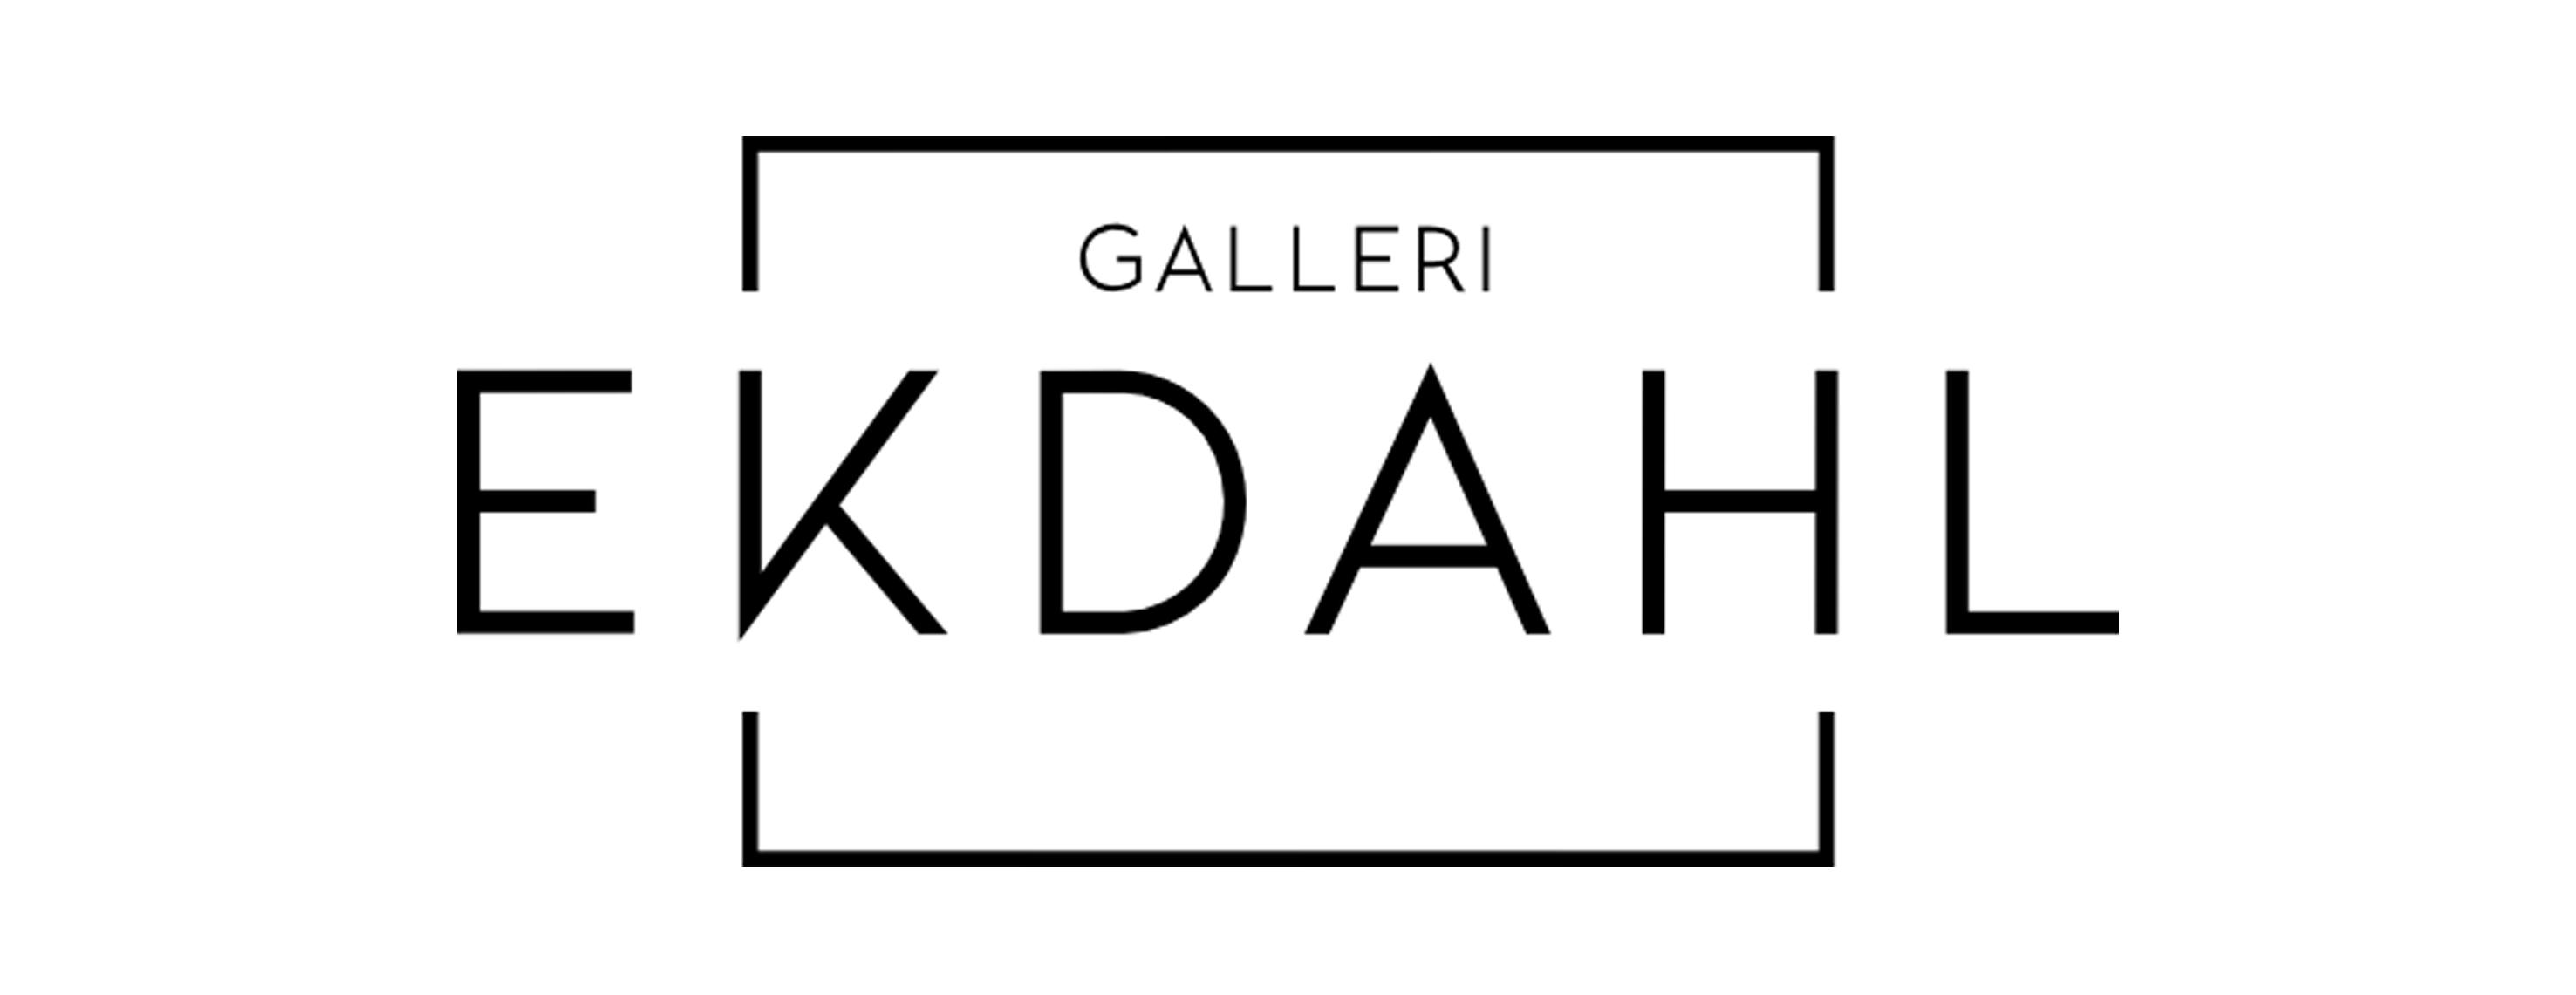 Galleri_ekdahl_logga